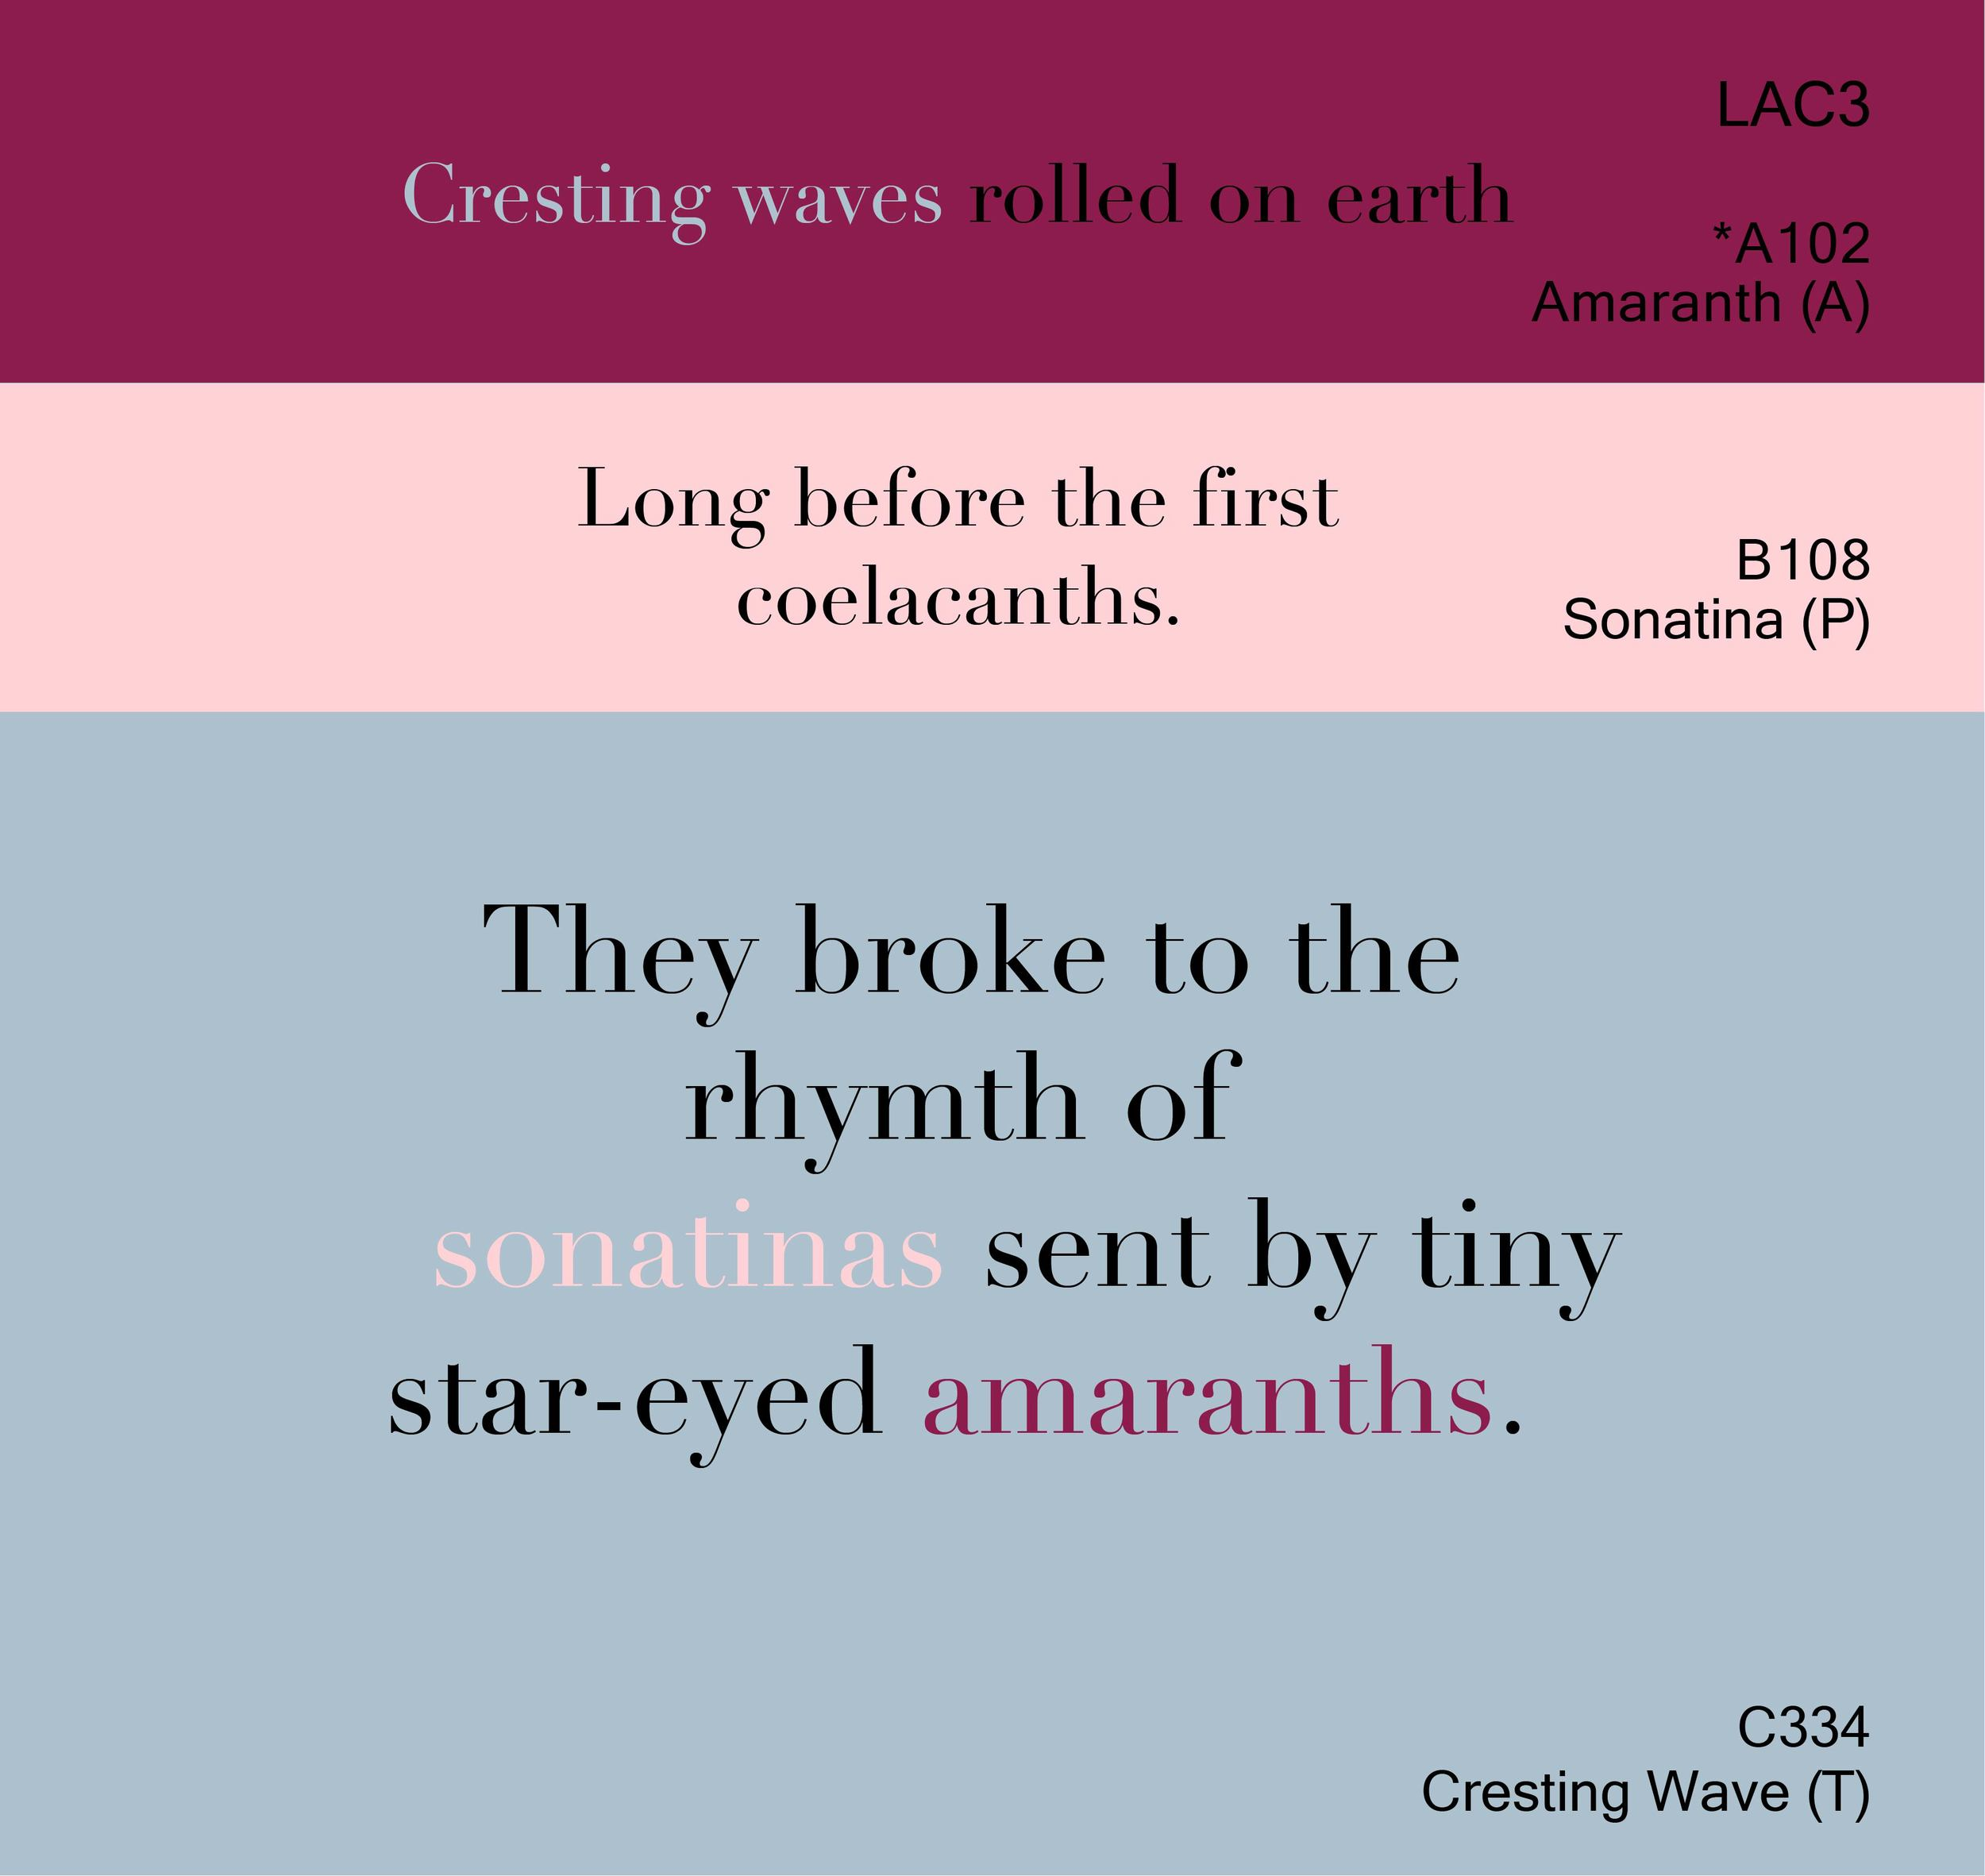 Amaranth, Sonatina, Cresting Wave II